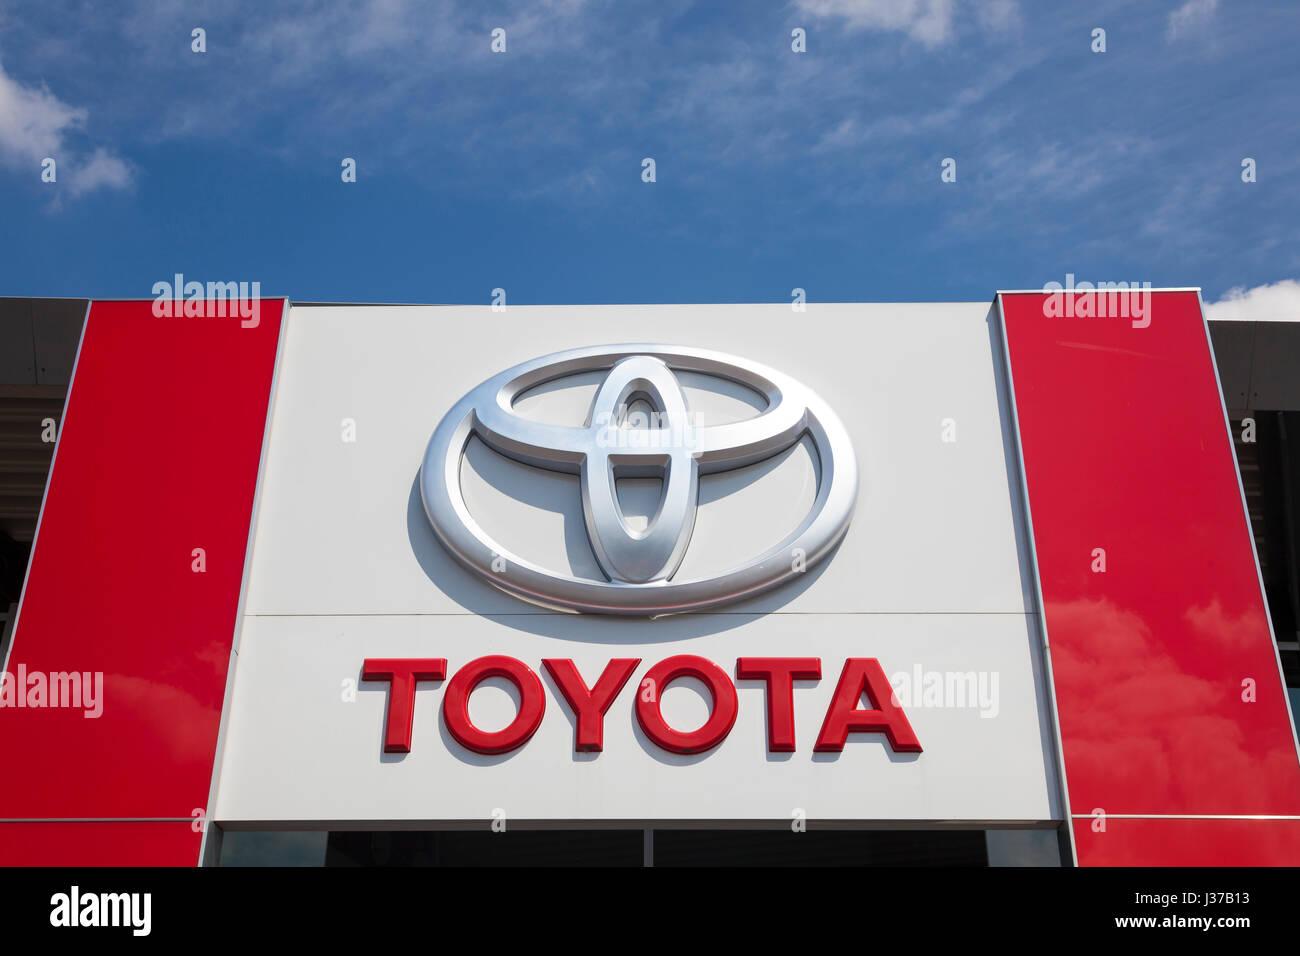 Big Lots Financing >> Toyota Dealership Stock Photos & Toyota Dealership Stock Images - Alamy